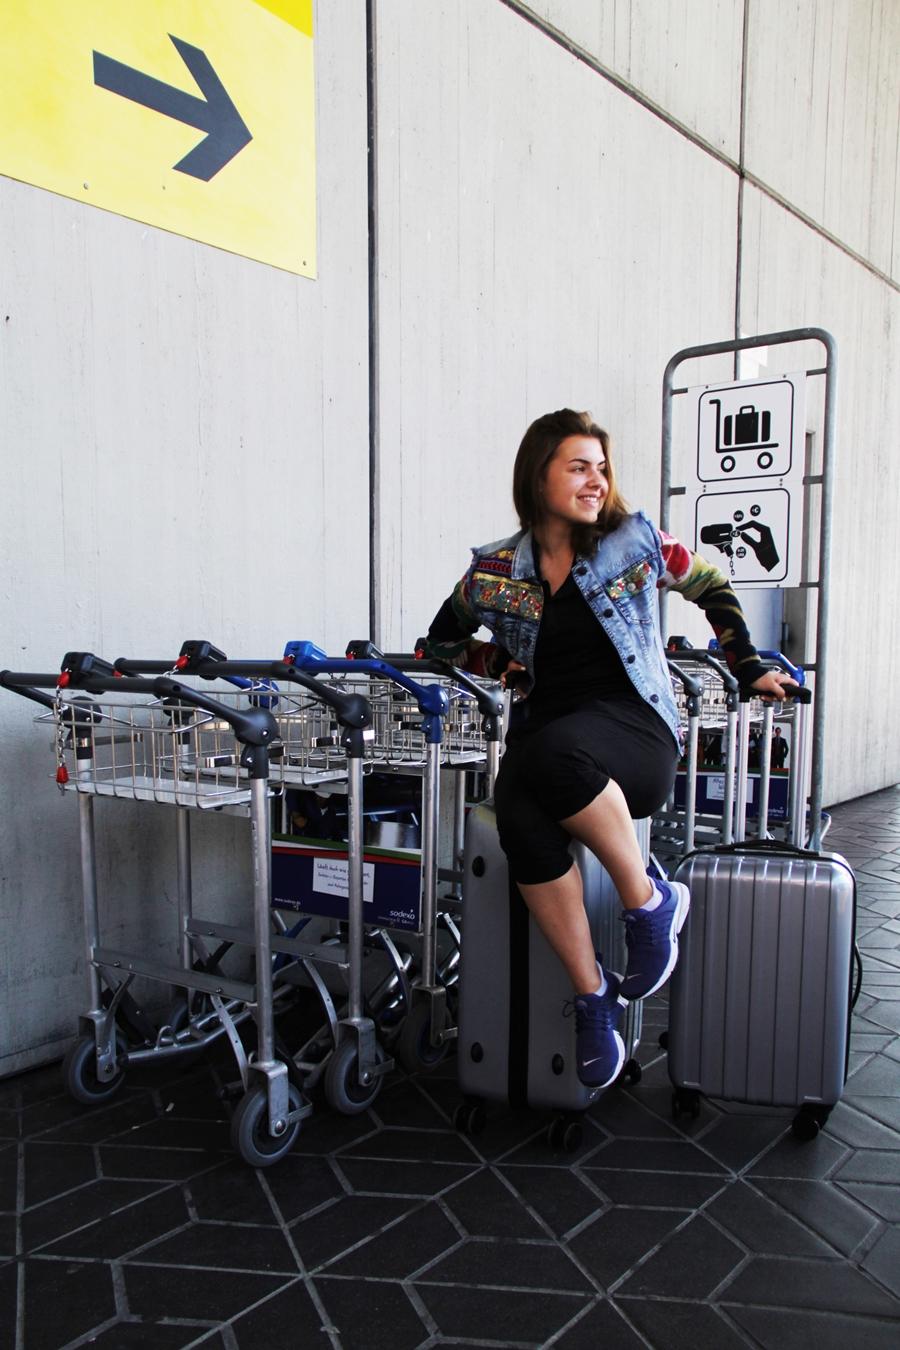 koffer fotoshooting flughafen